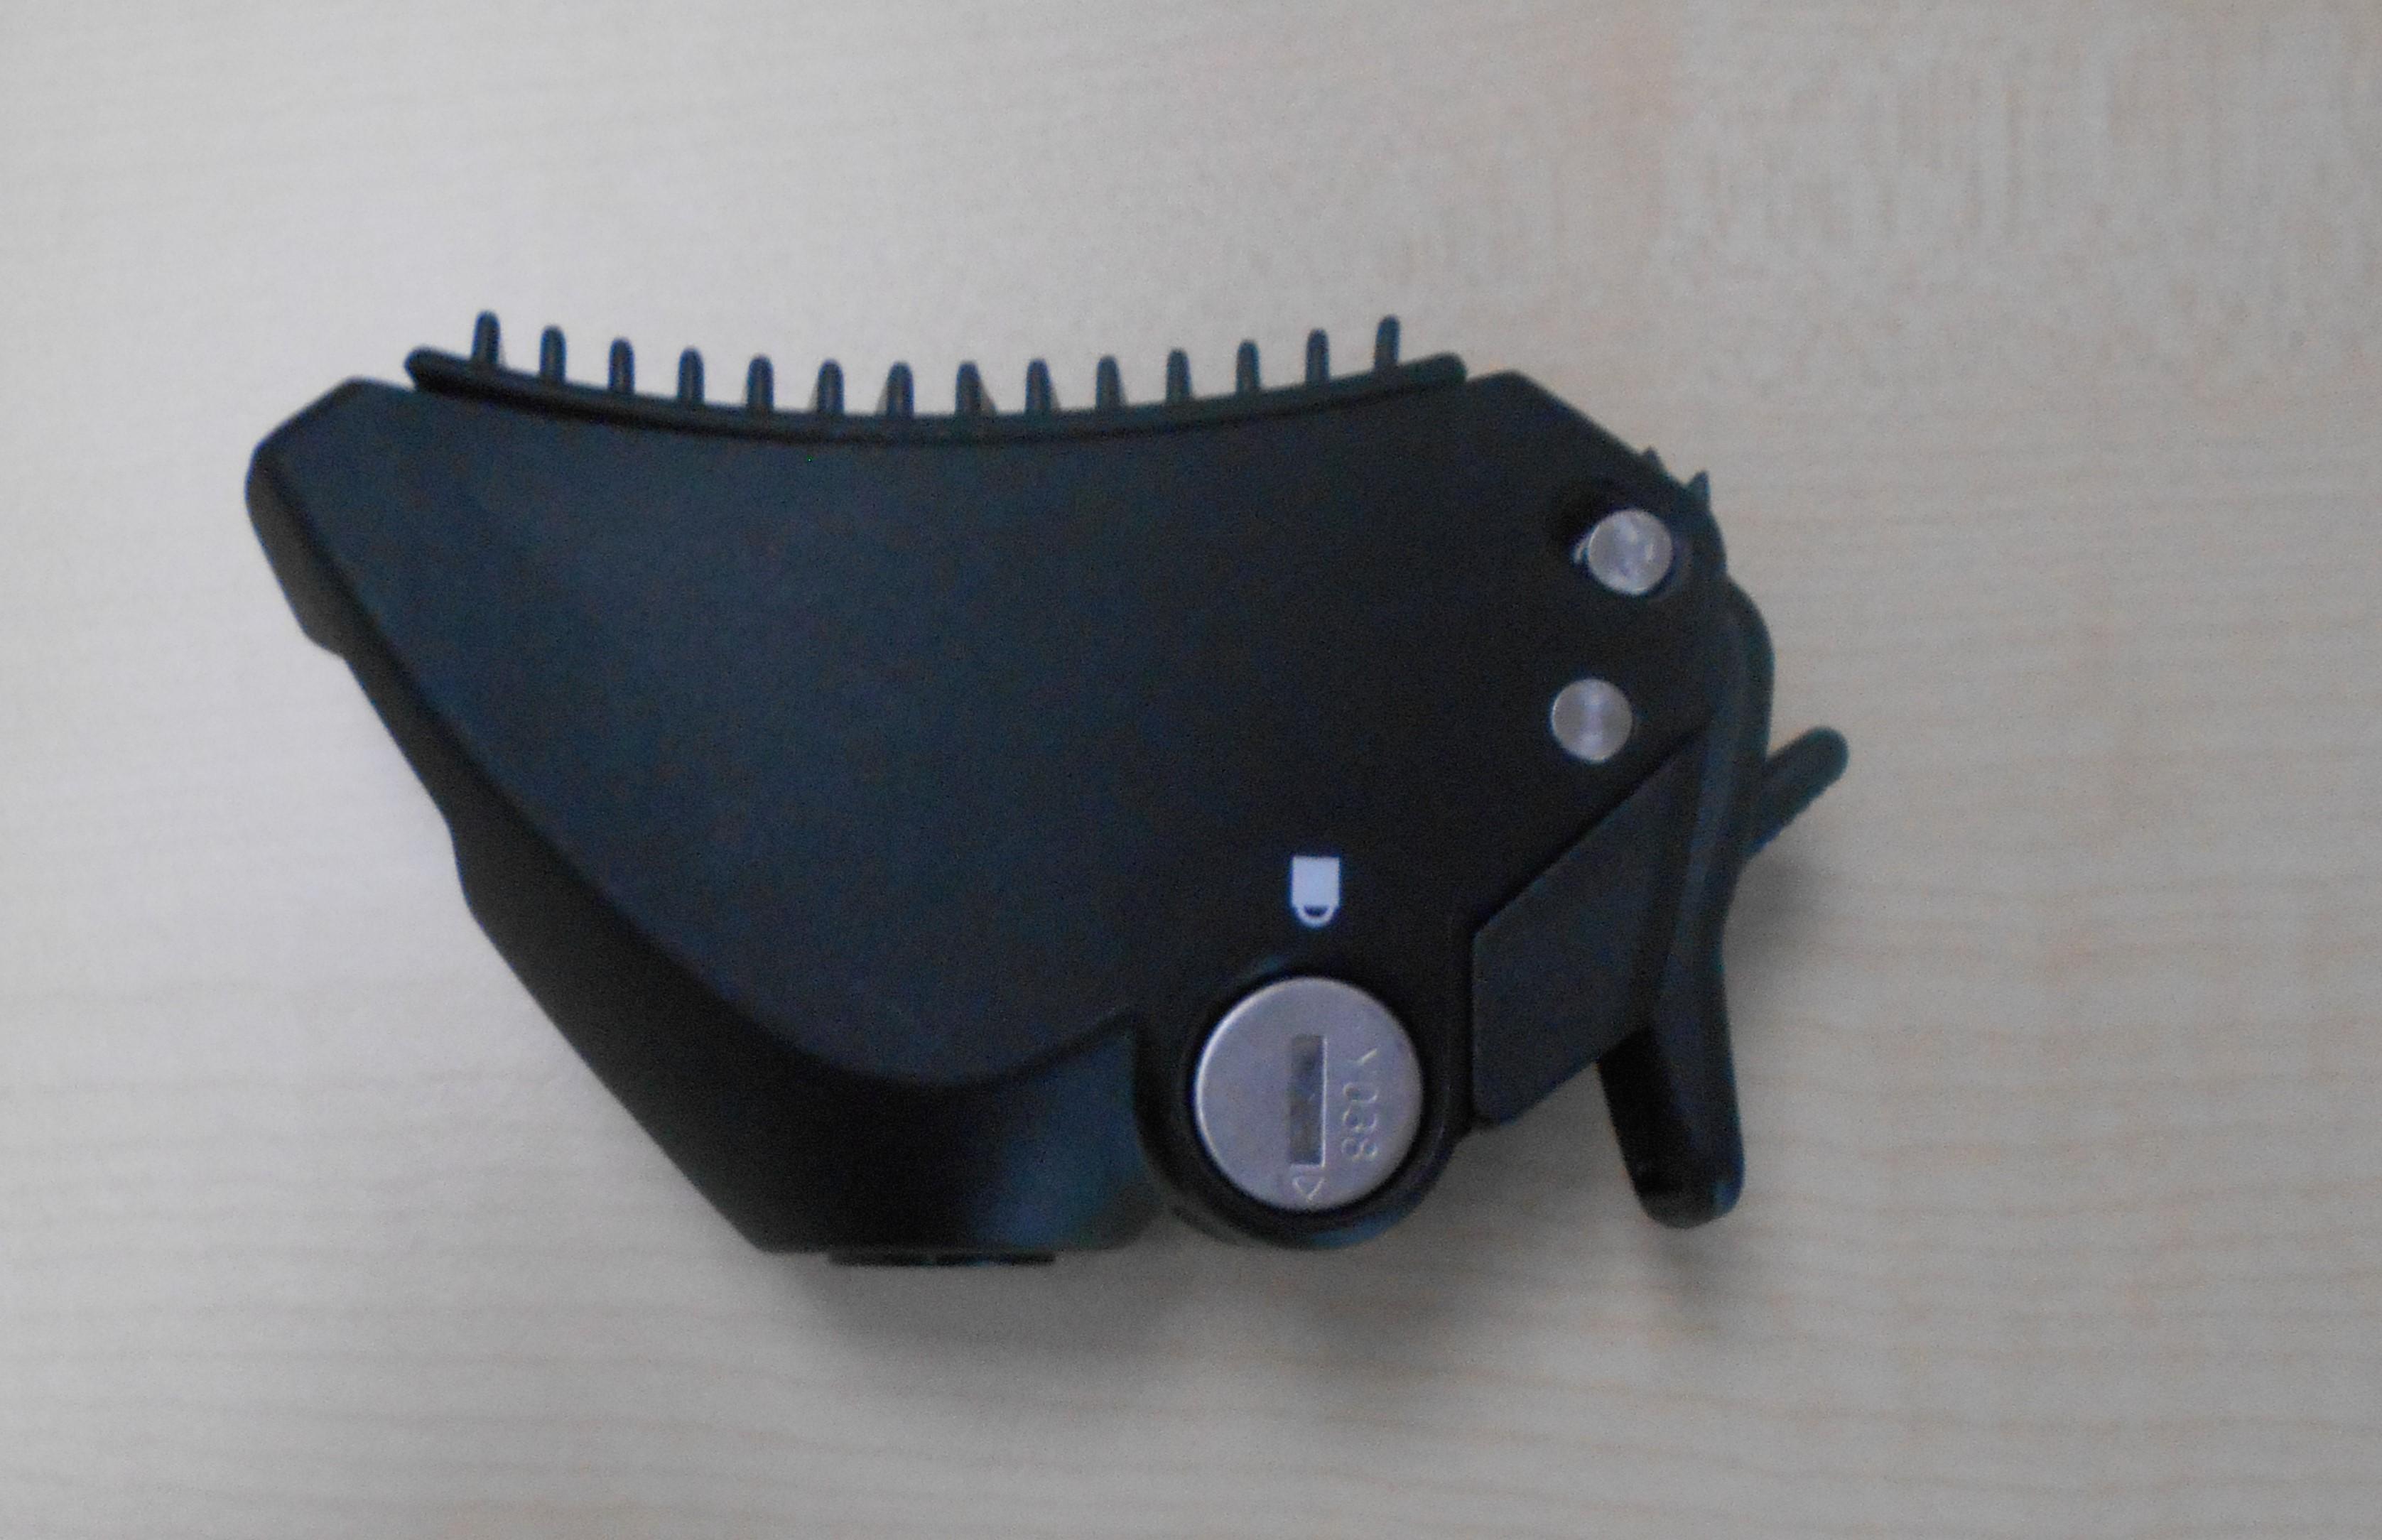 Kopf E-Bike Rahmenhalter mit Schlosscode Y002